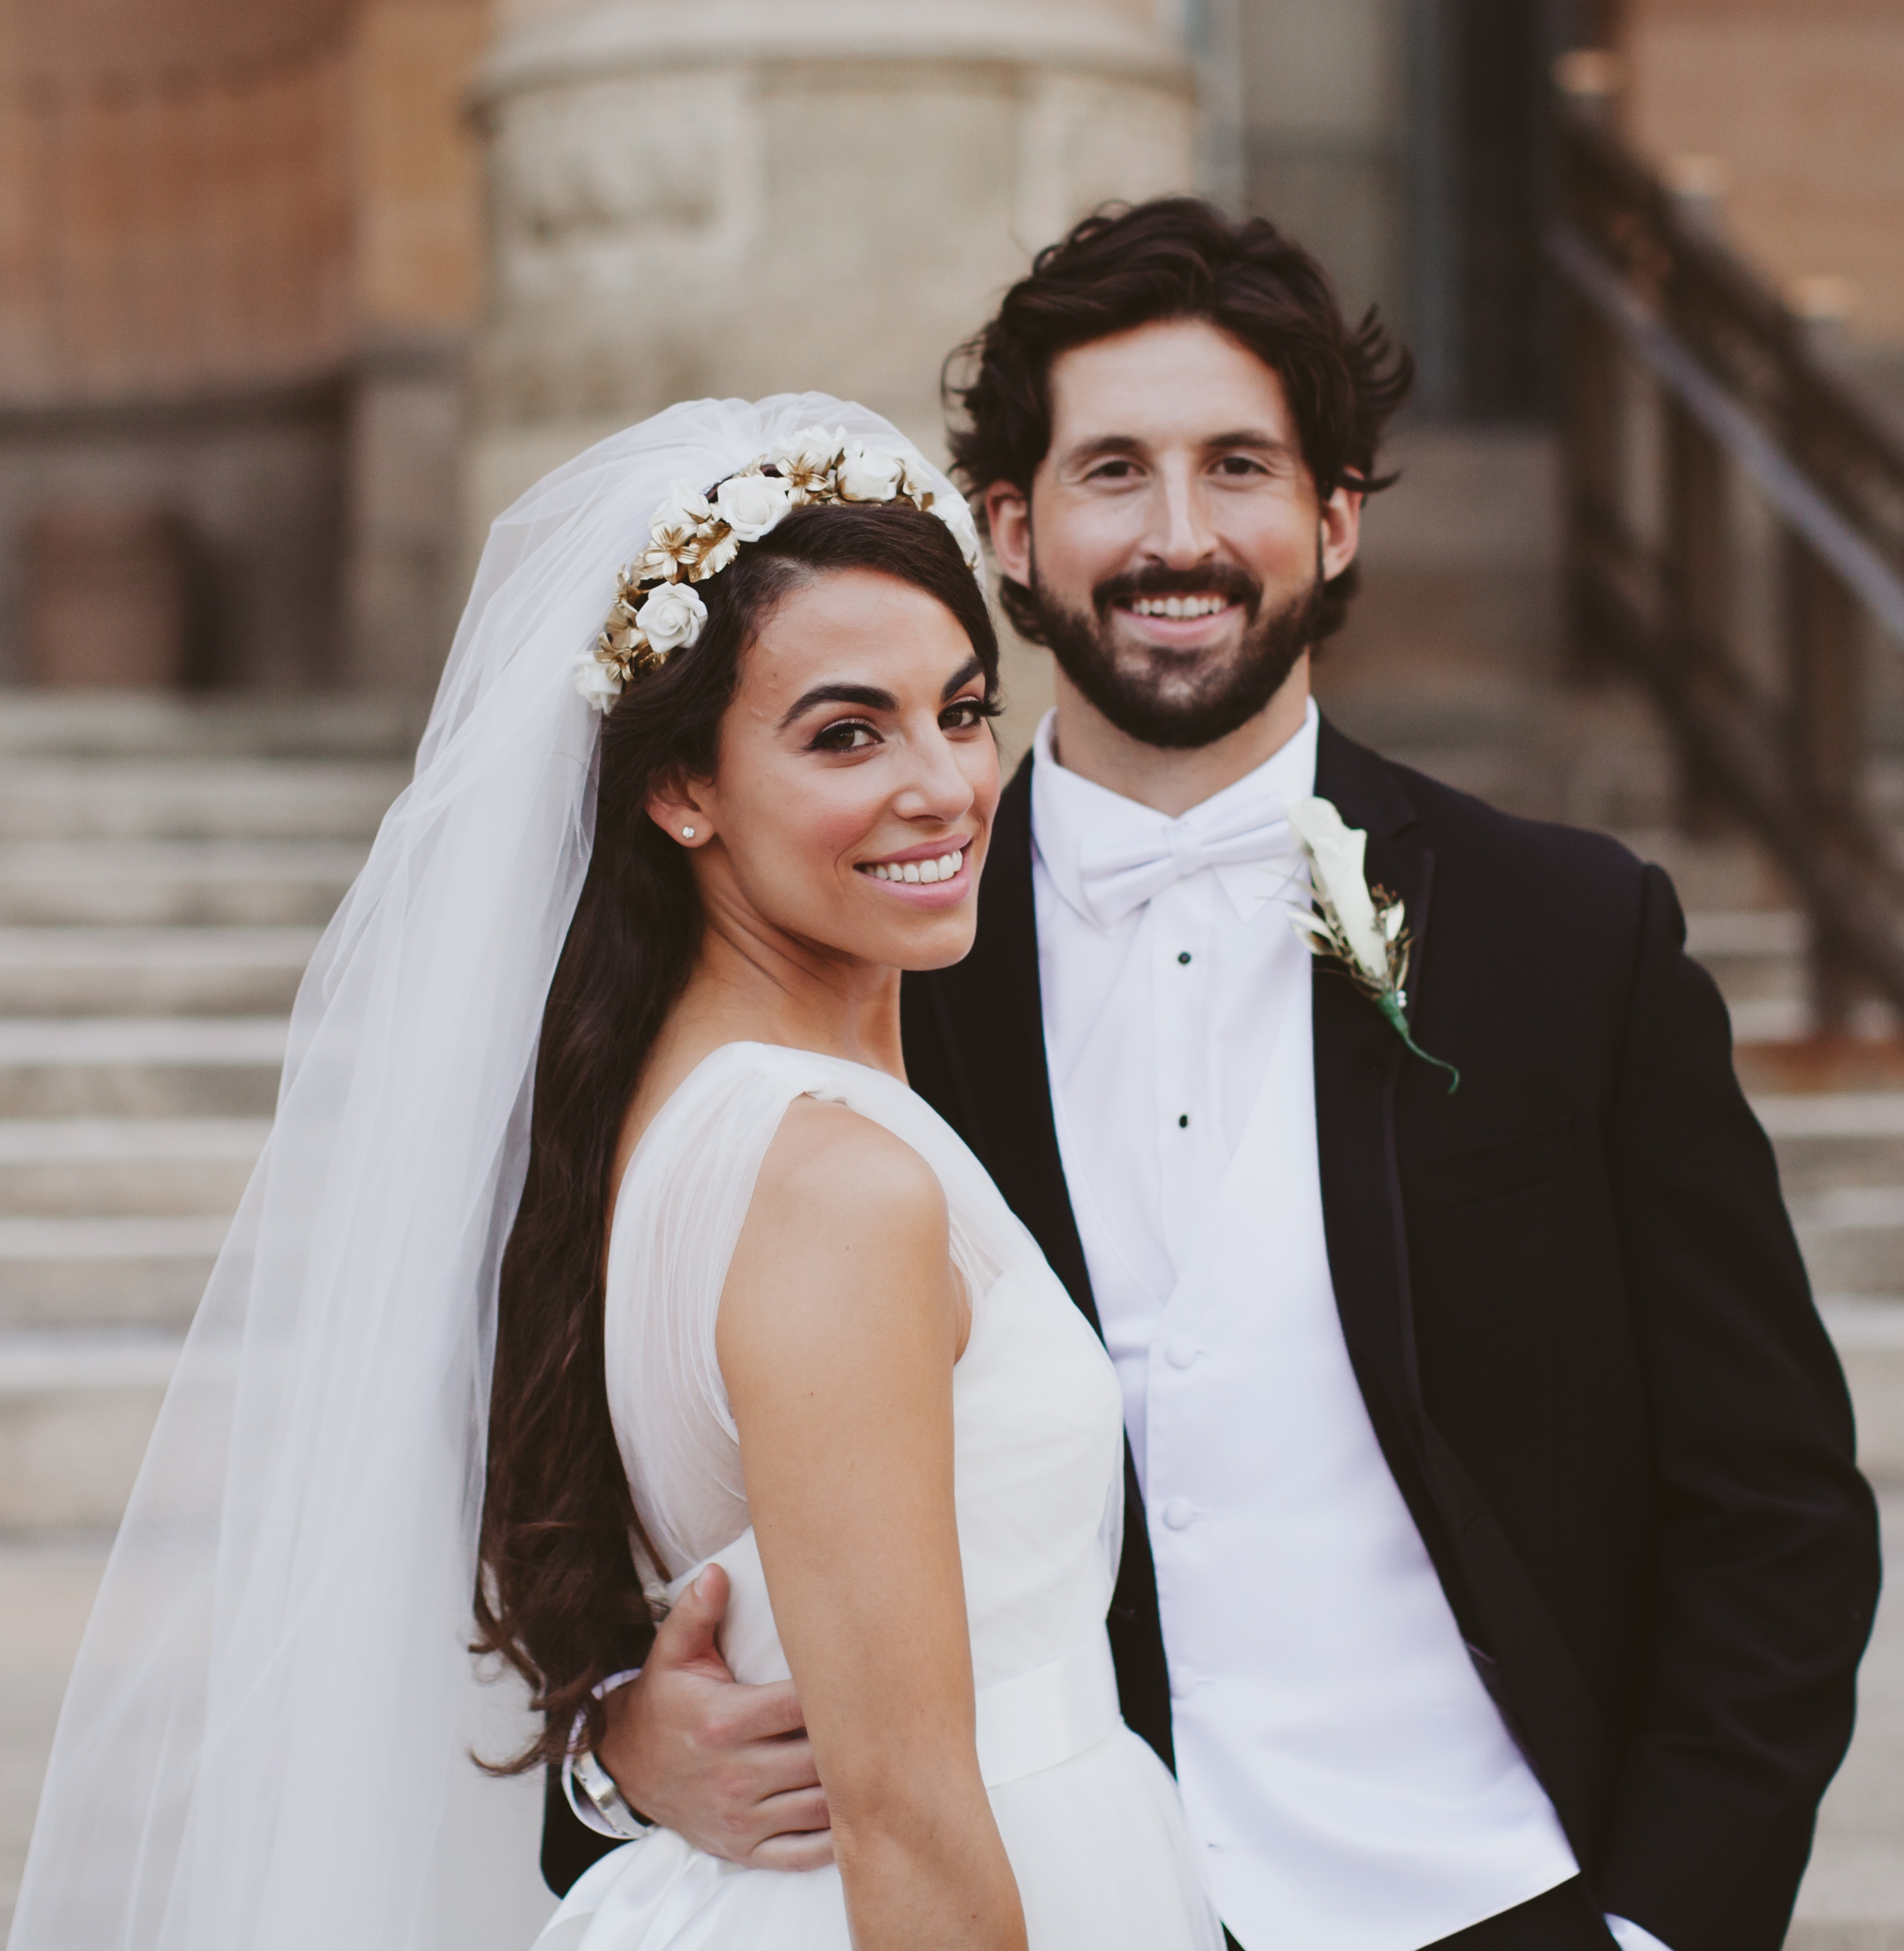 Nicole Krestos and Steven Guzski